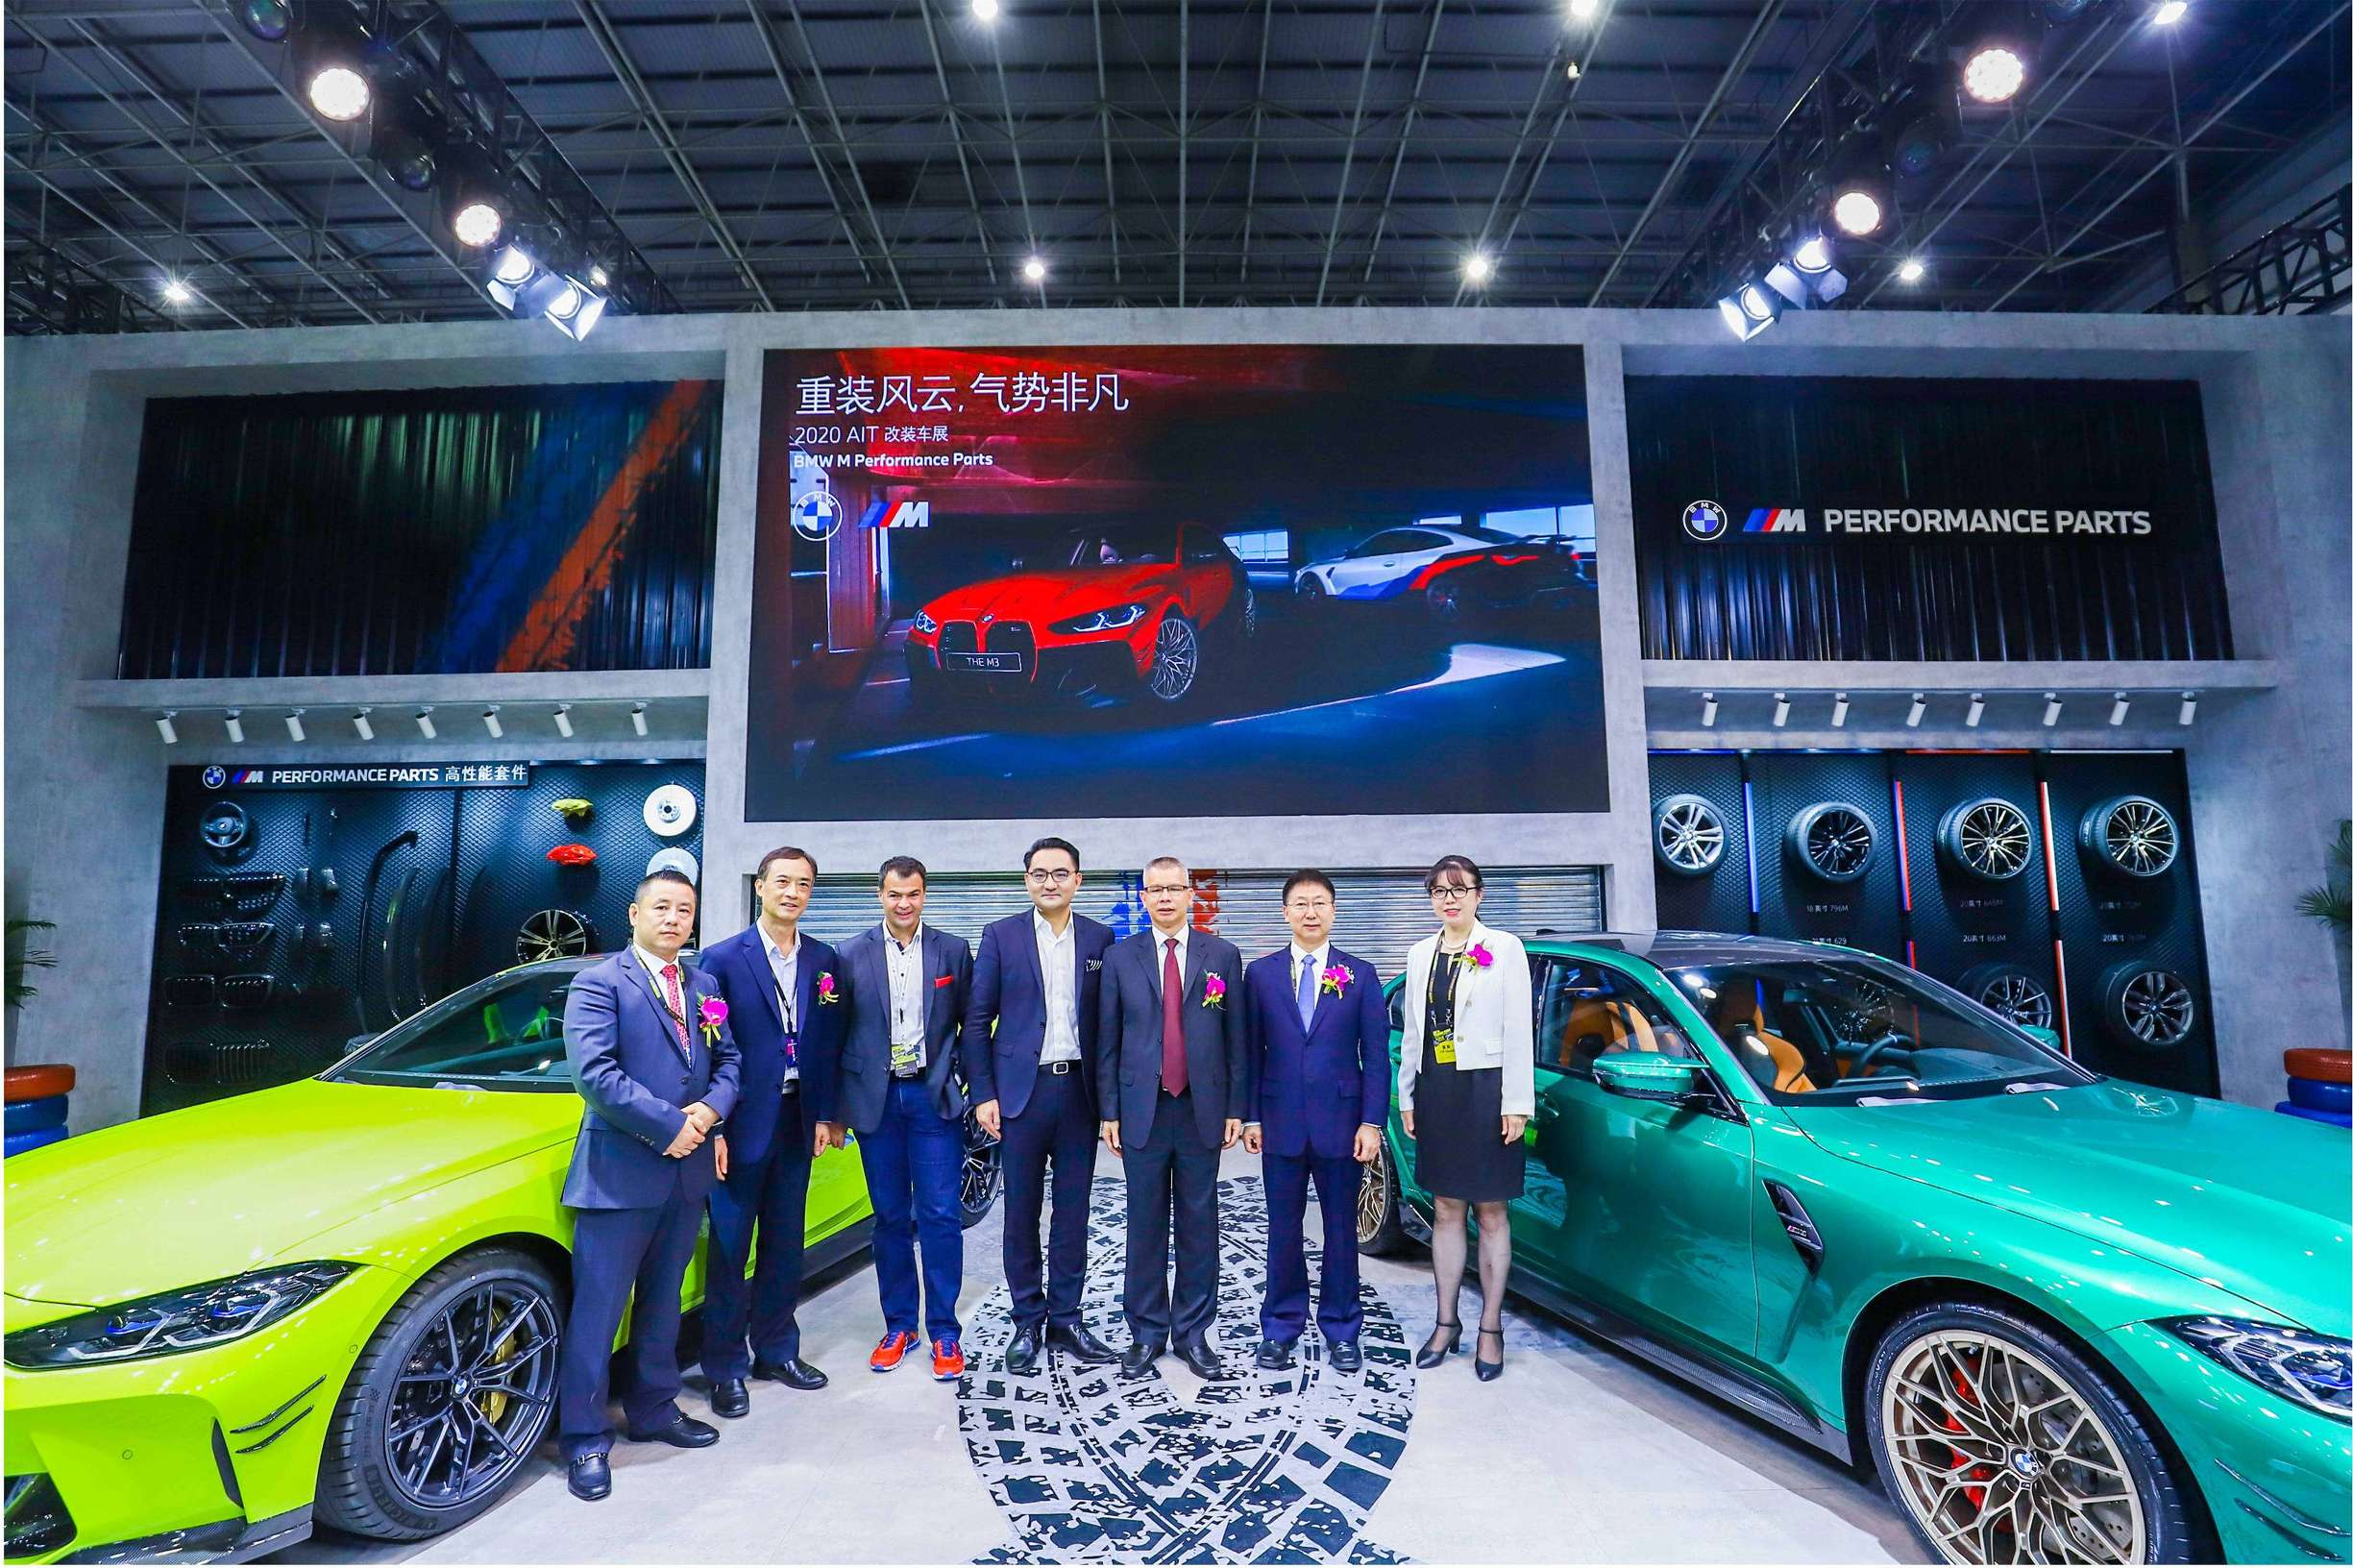 BMW携全新高性能产品亮相2020 AIT东莞改装车展